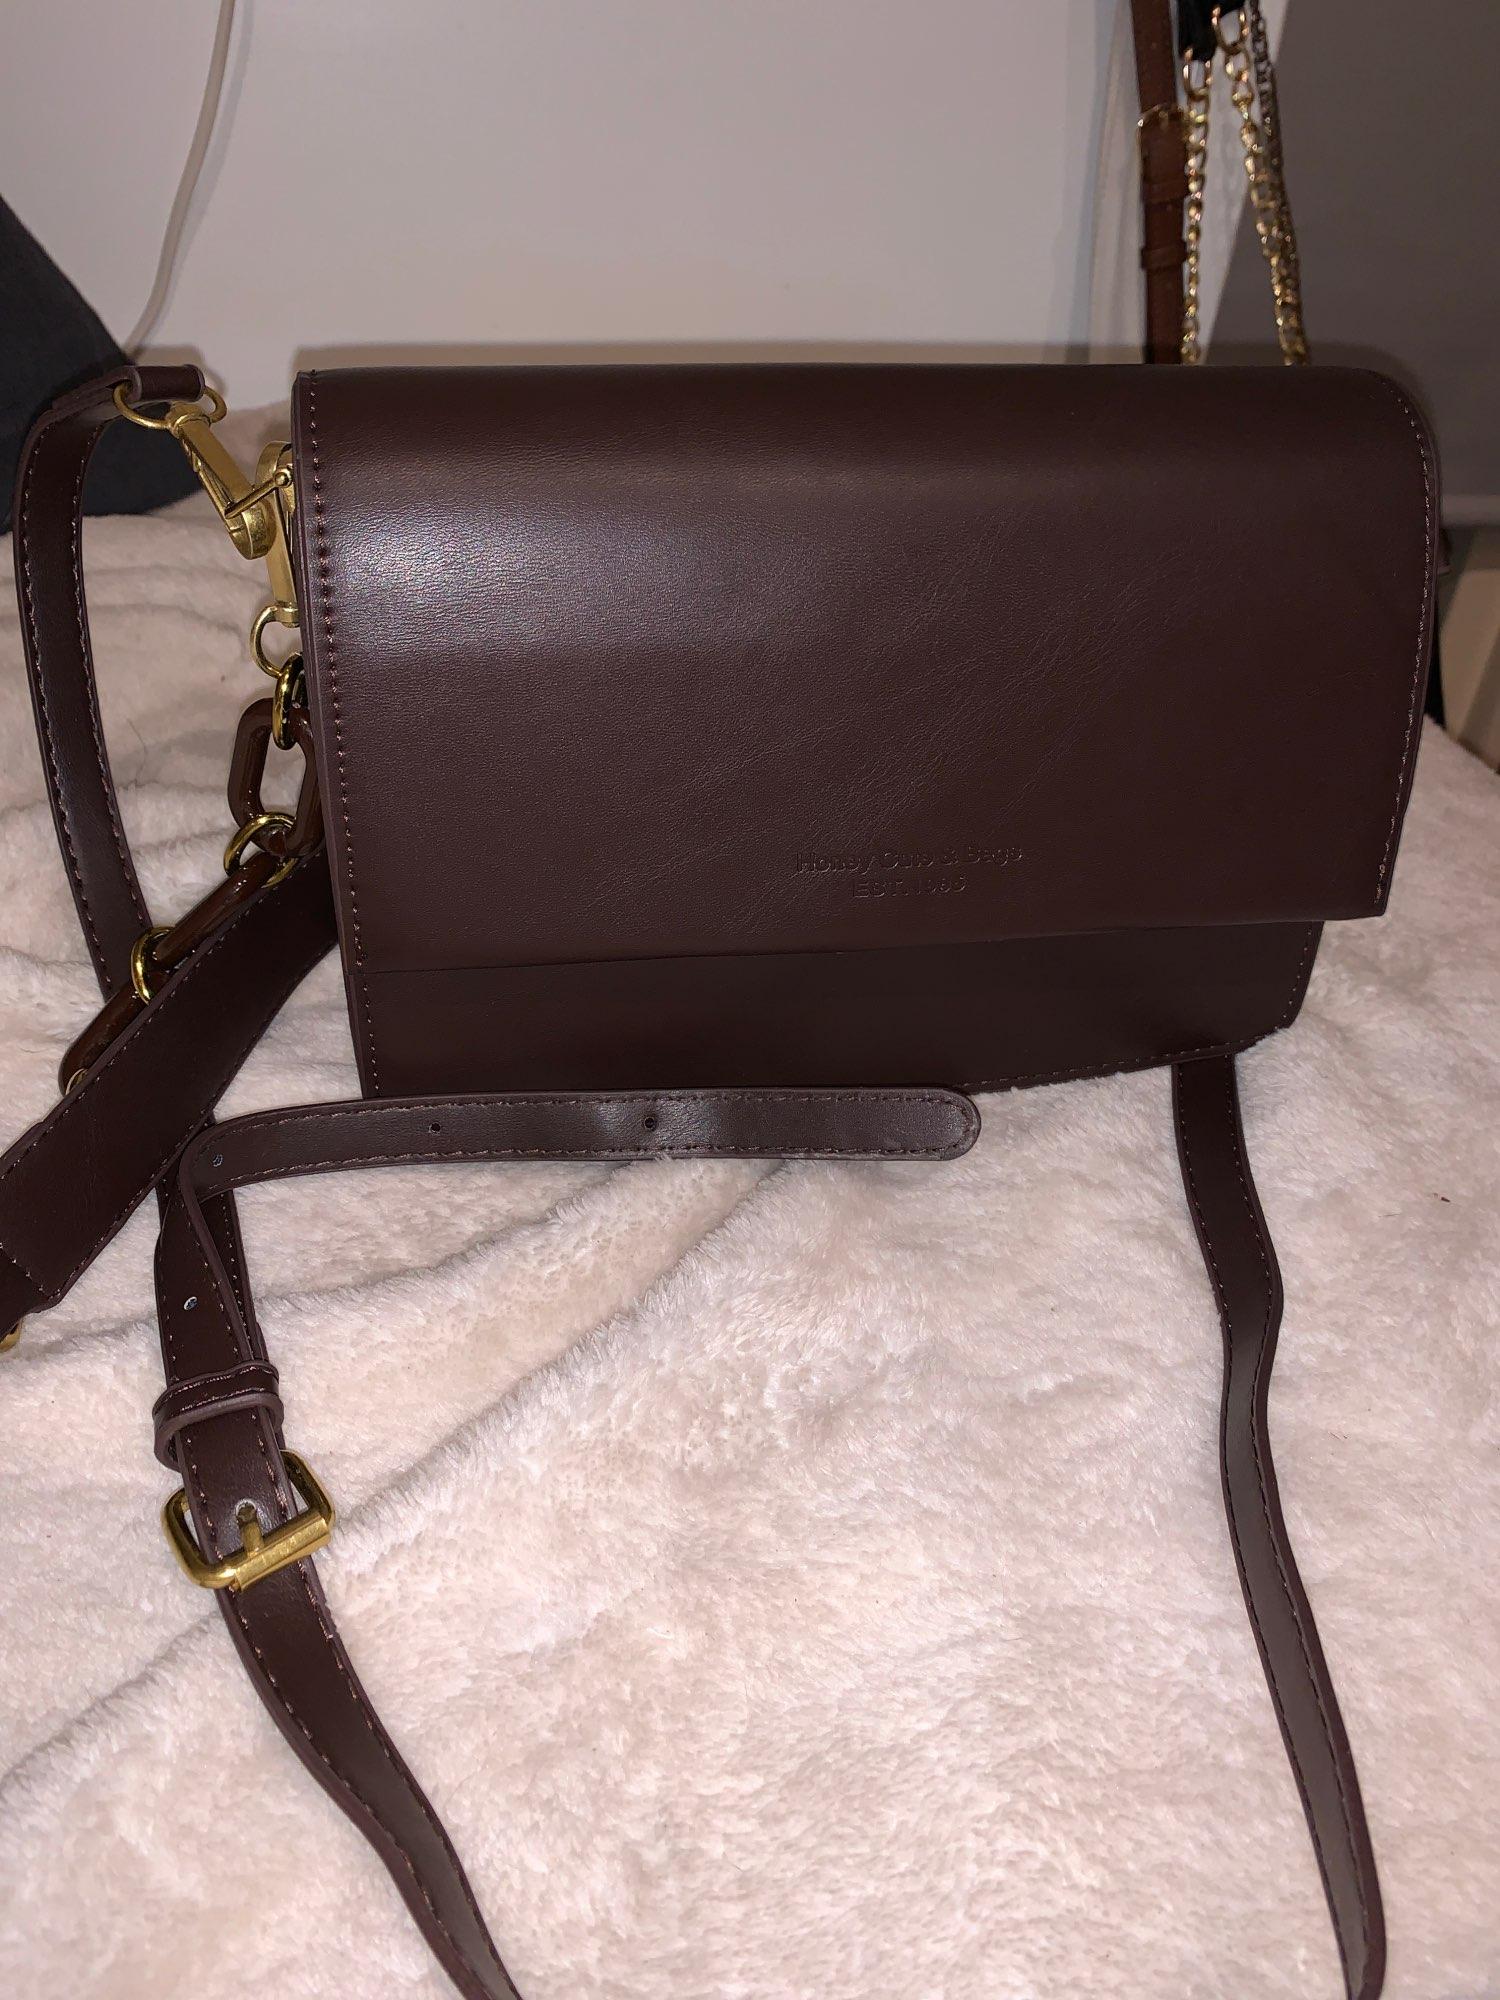 Ladies handbag fashion small square bag casual lady bag messenger bag retro tofu bag solid color shoulder bag mobile phone bag photo review